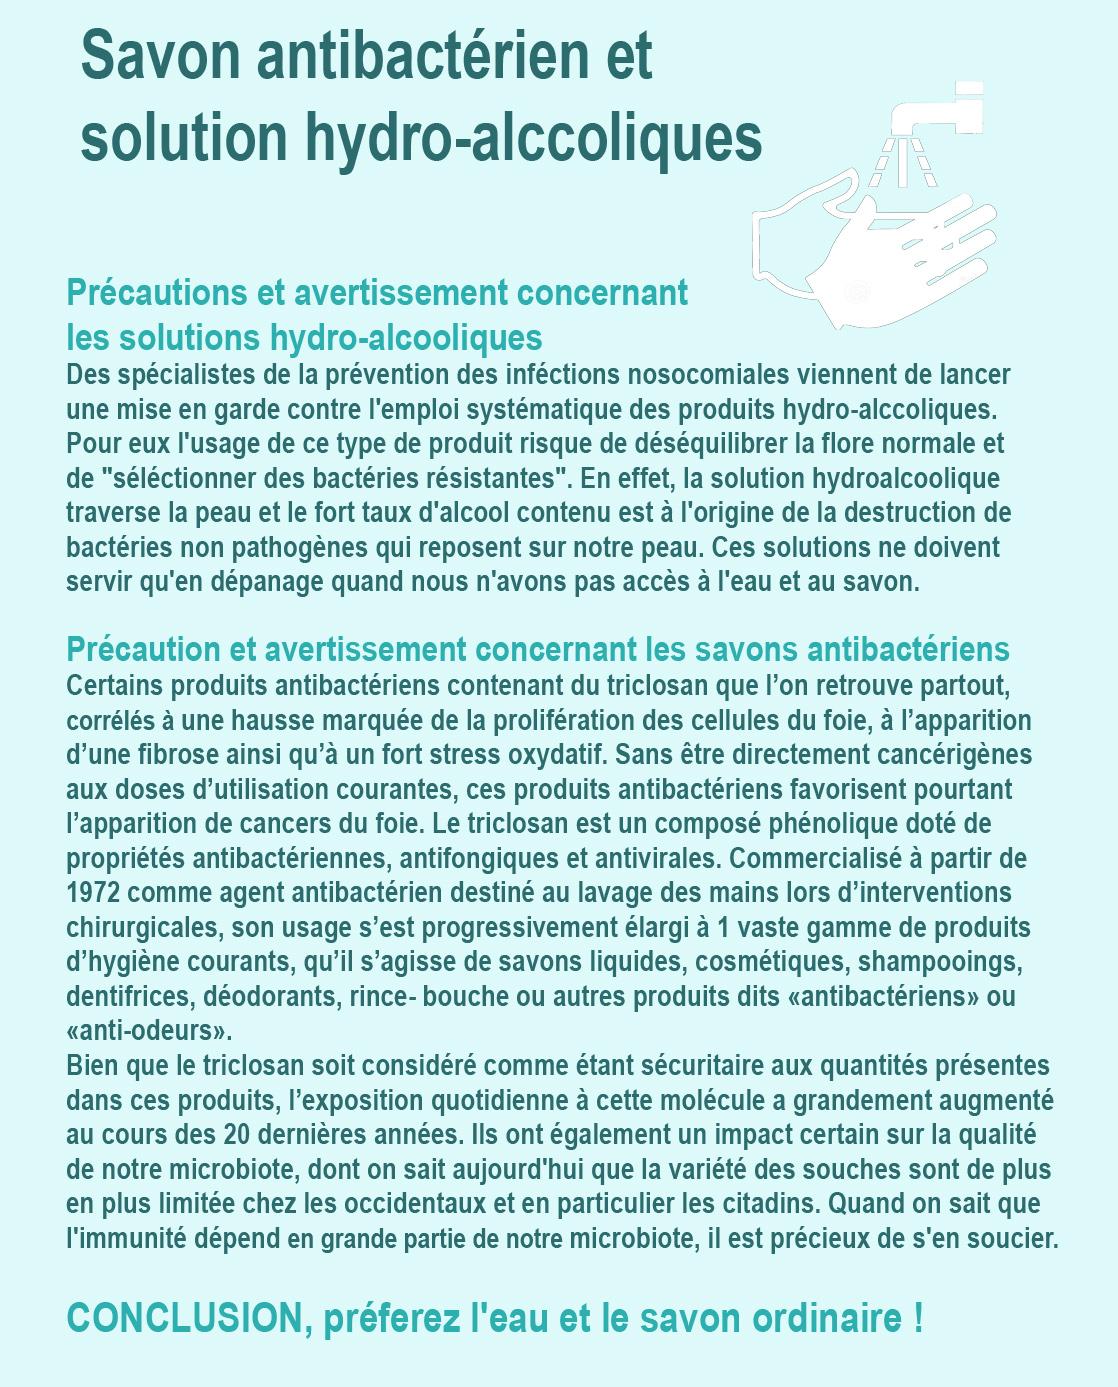 0-Antibacterien et hydro-alccoliques copie.jpg